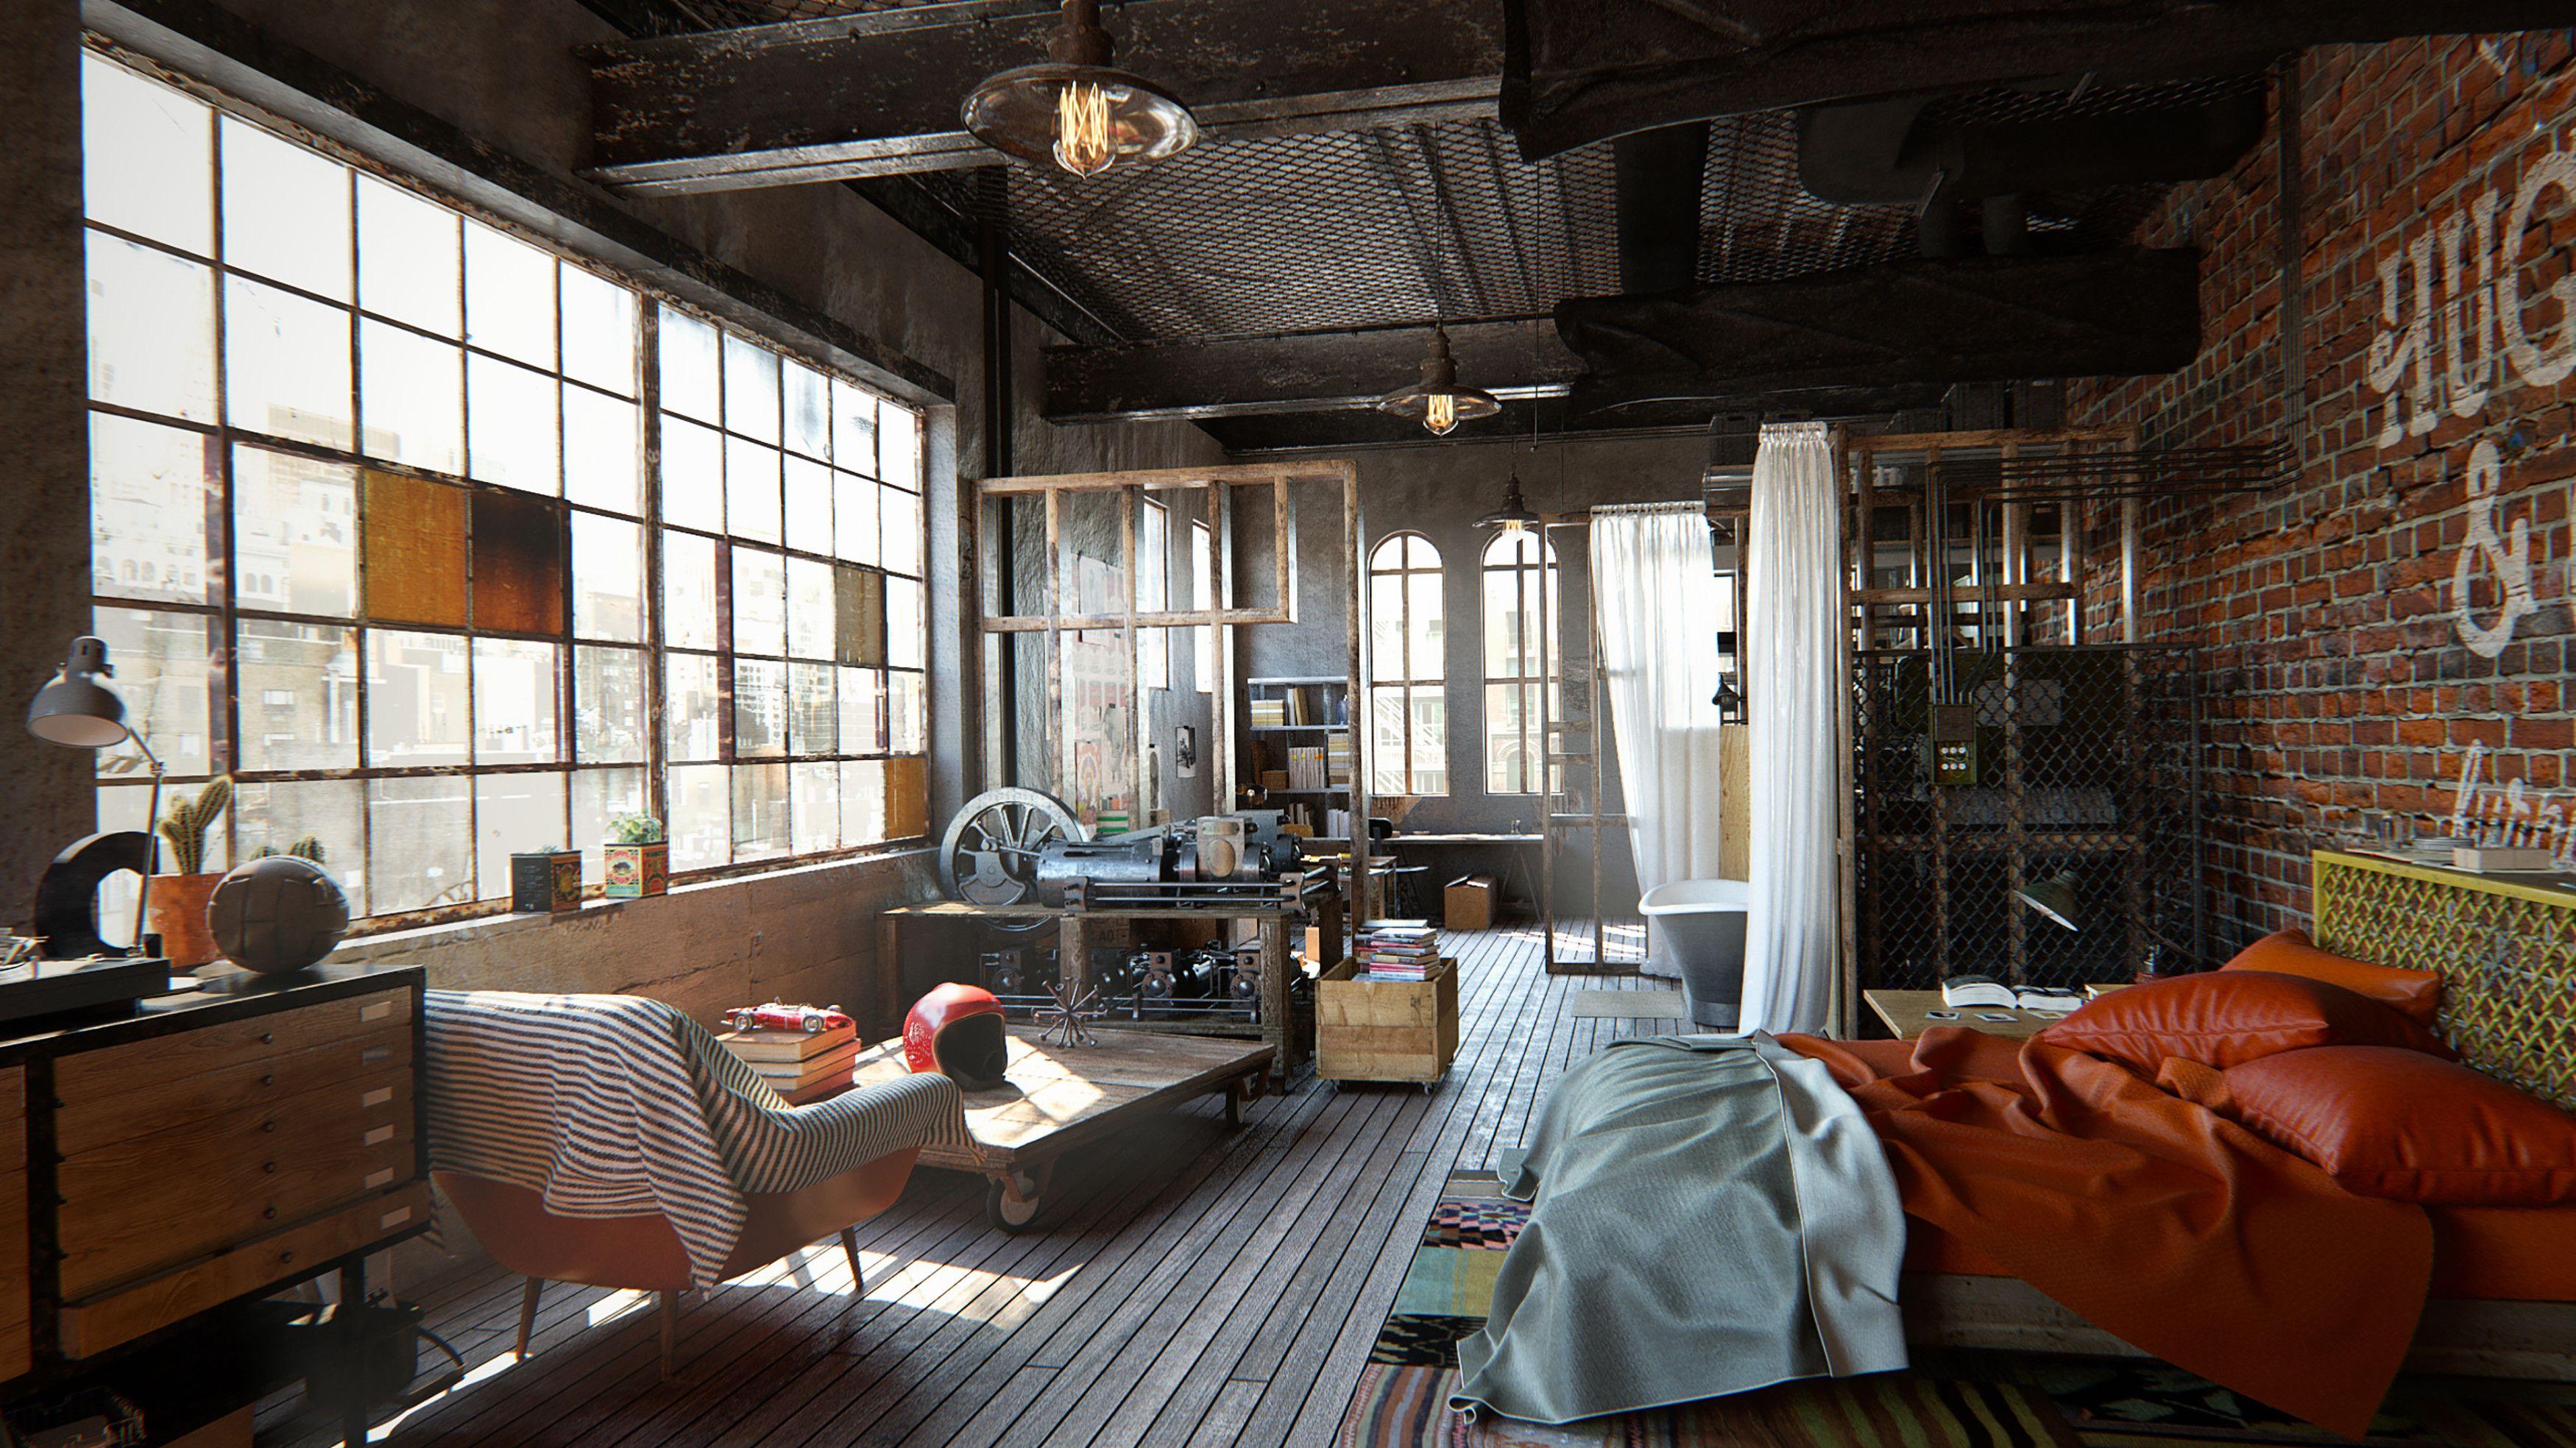 3D Model Of Nyc Brooklyn Loft